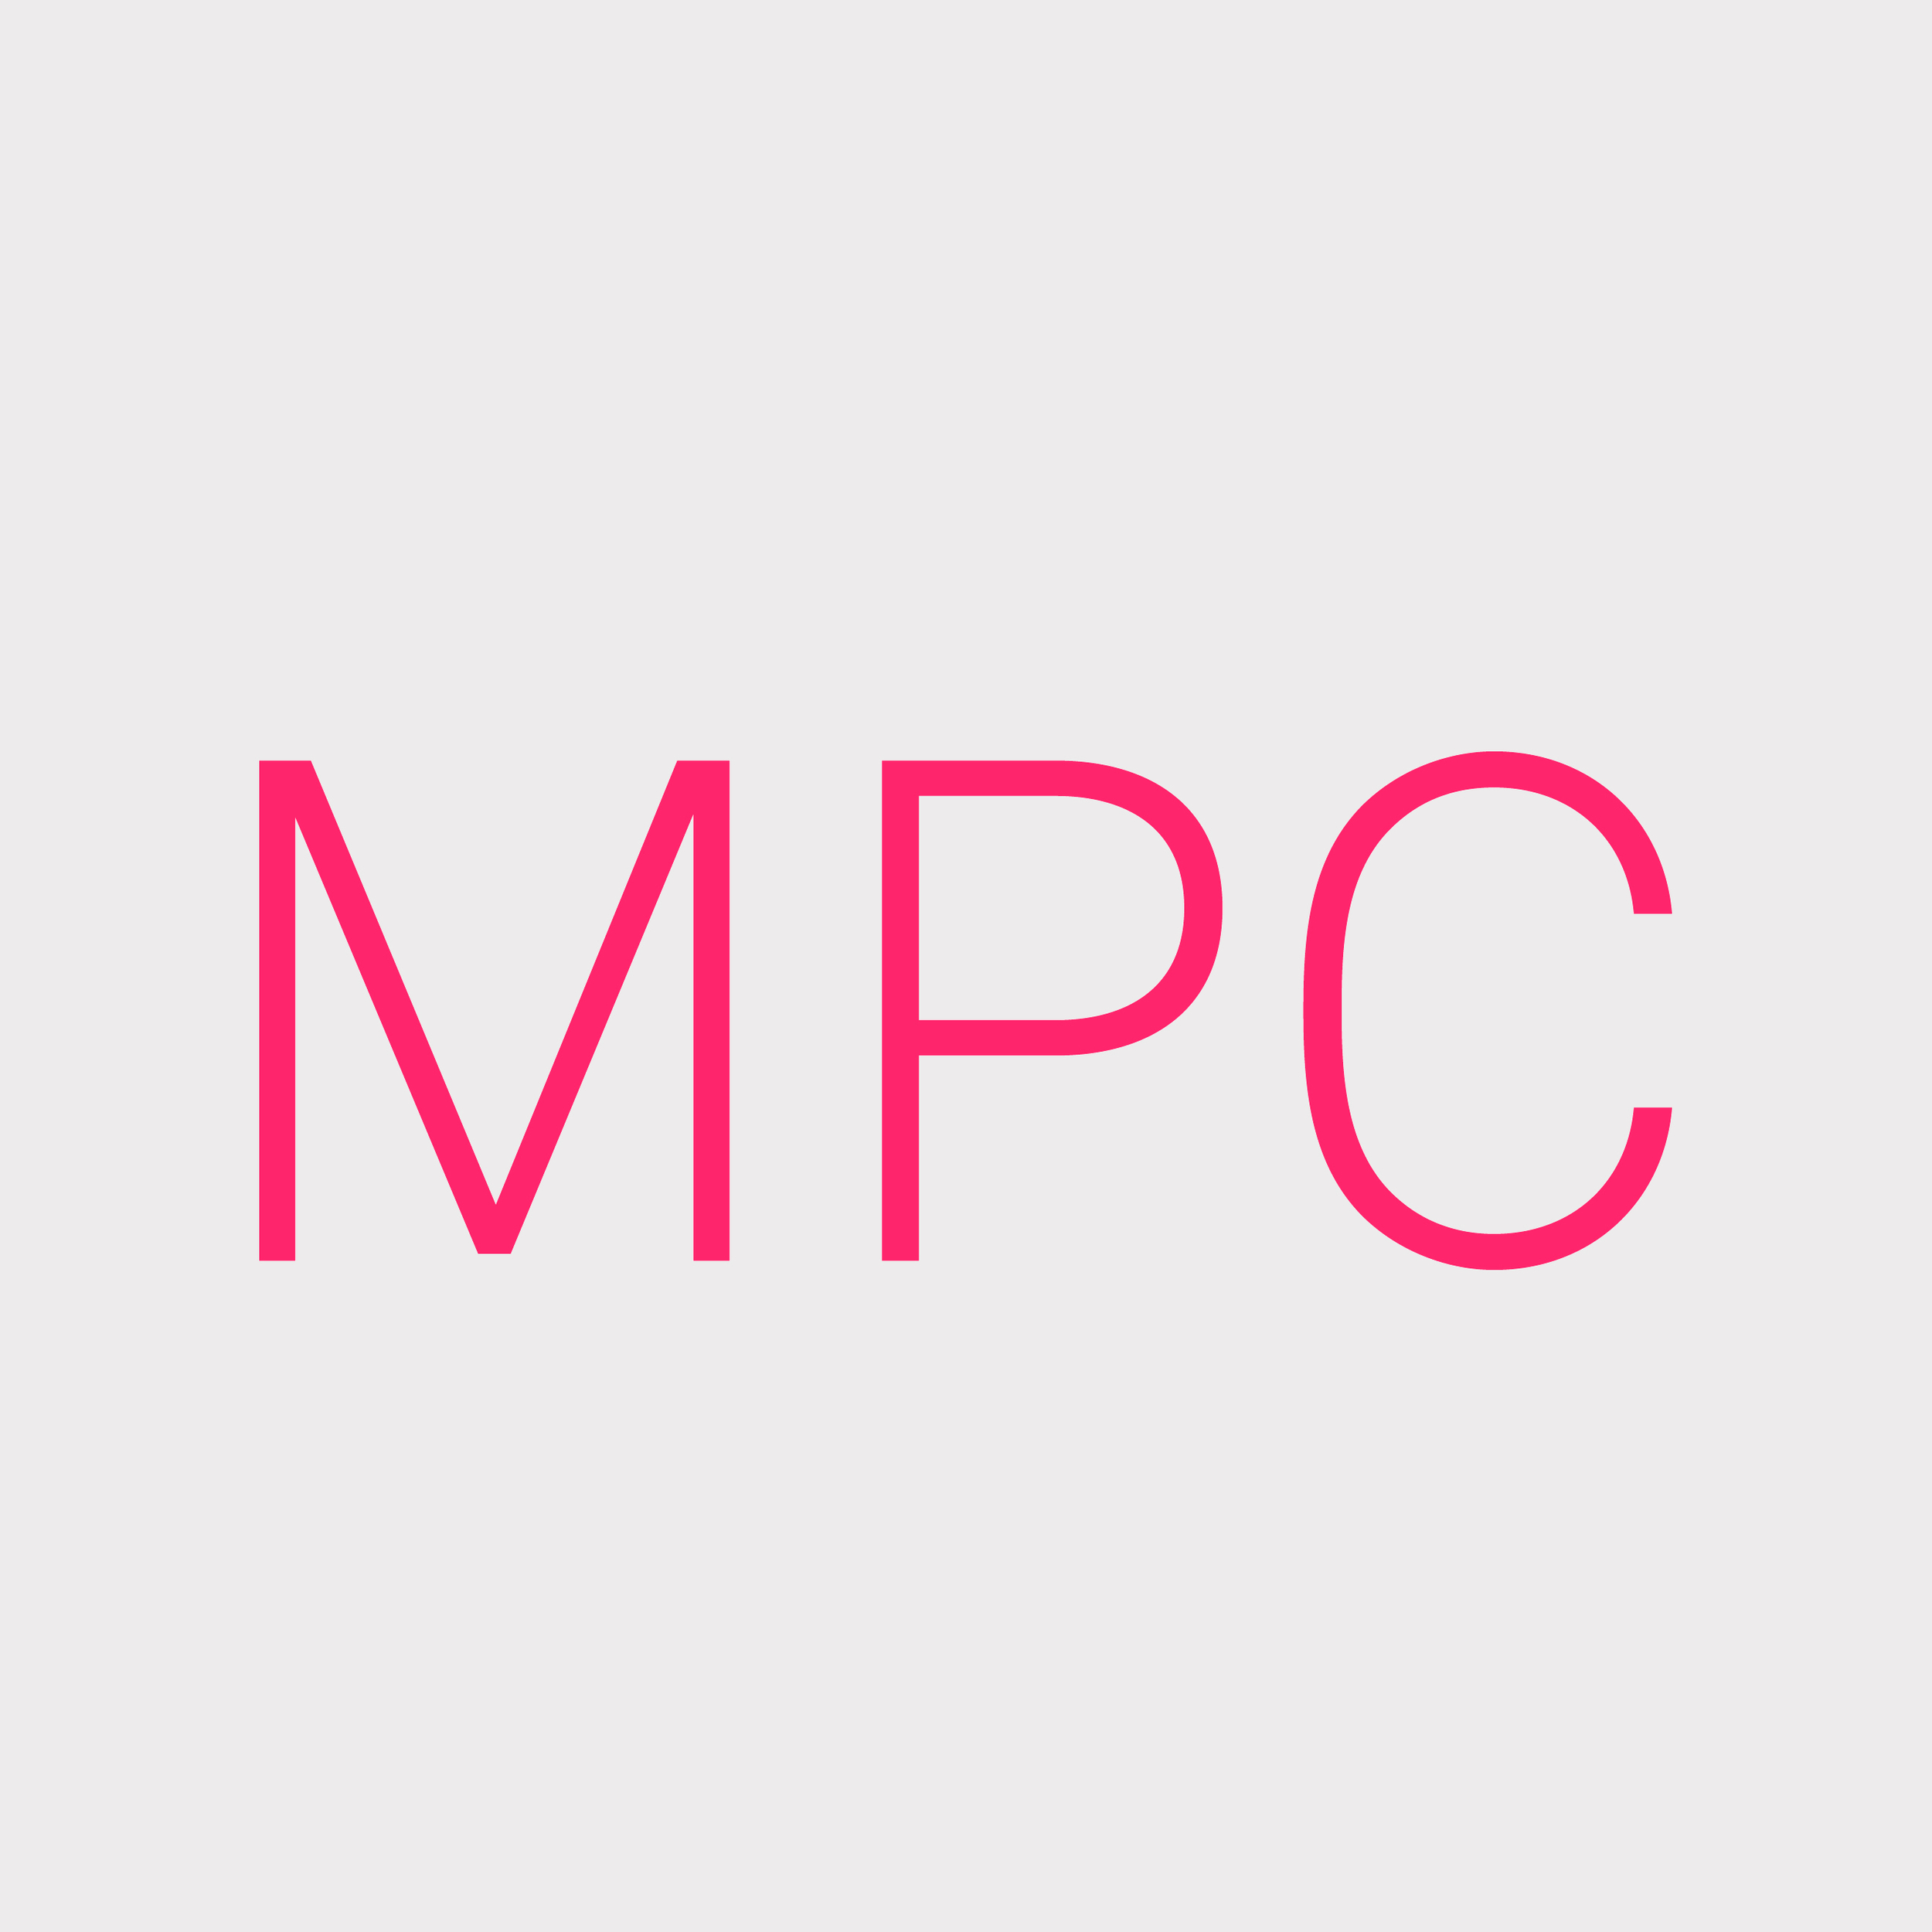 MPC_Wordmark_PMS_812_RGB_v2Site.jpg